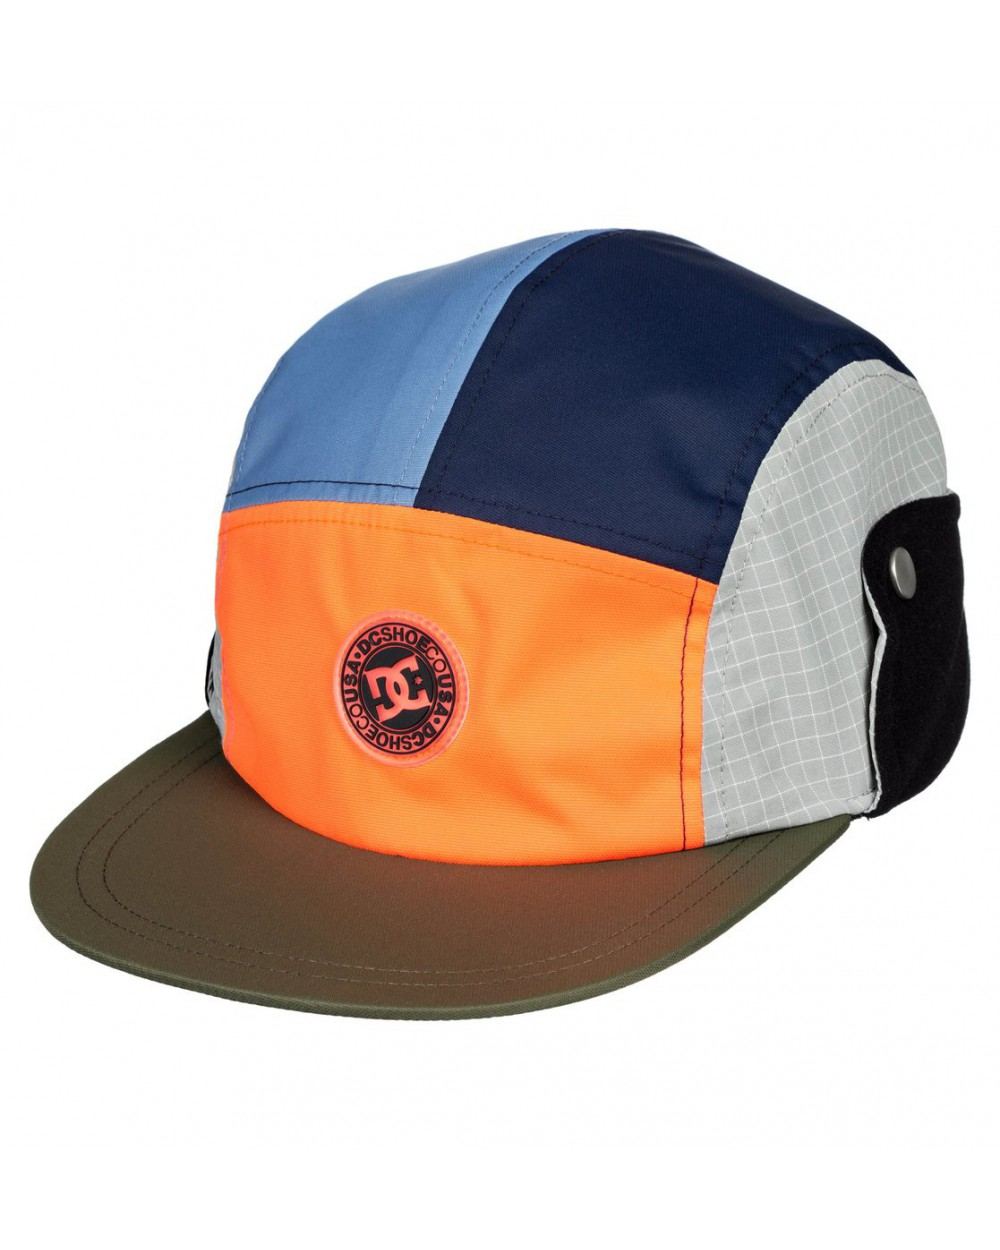 Dc Boomdocks Camper Cap - Multi Repurpose B Solid (xngb)